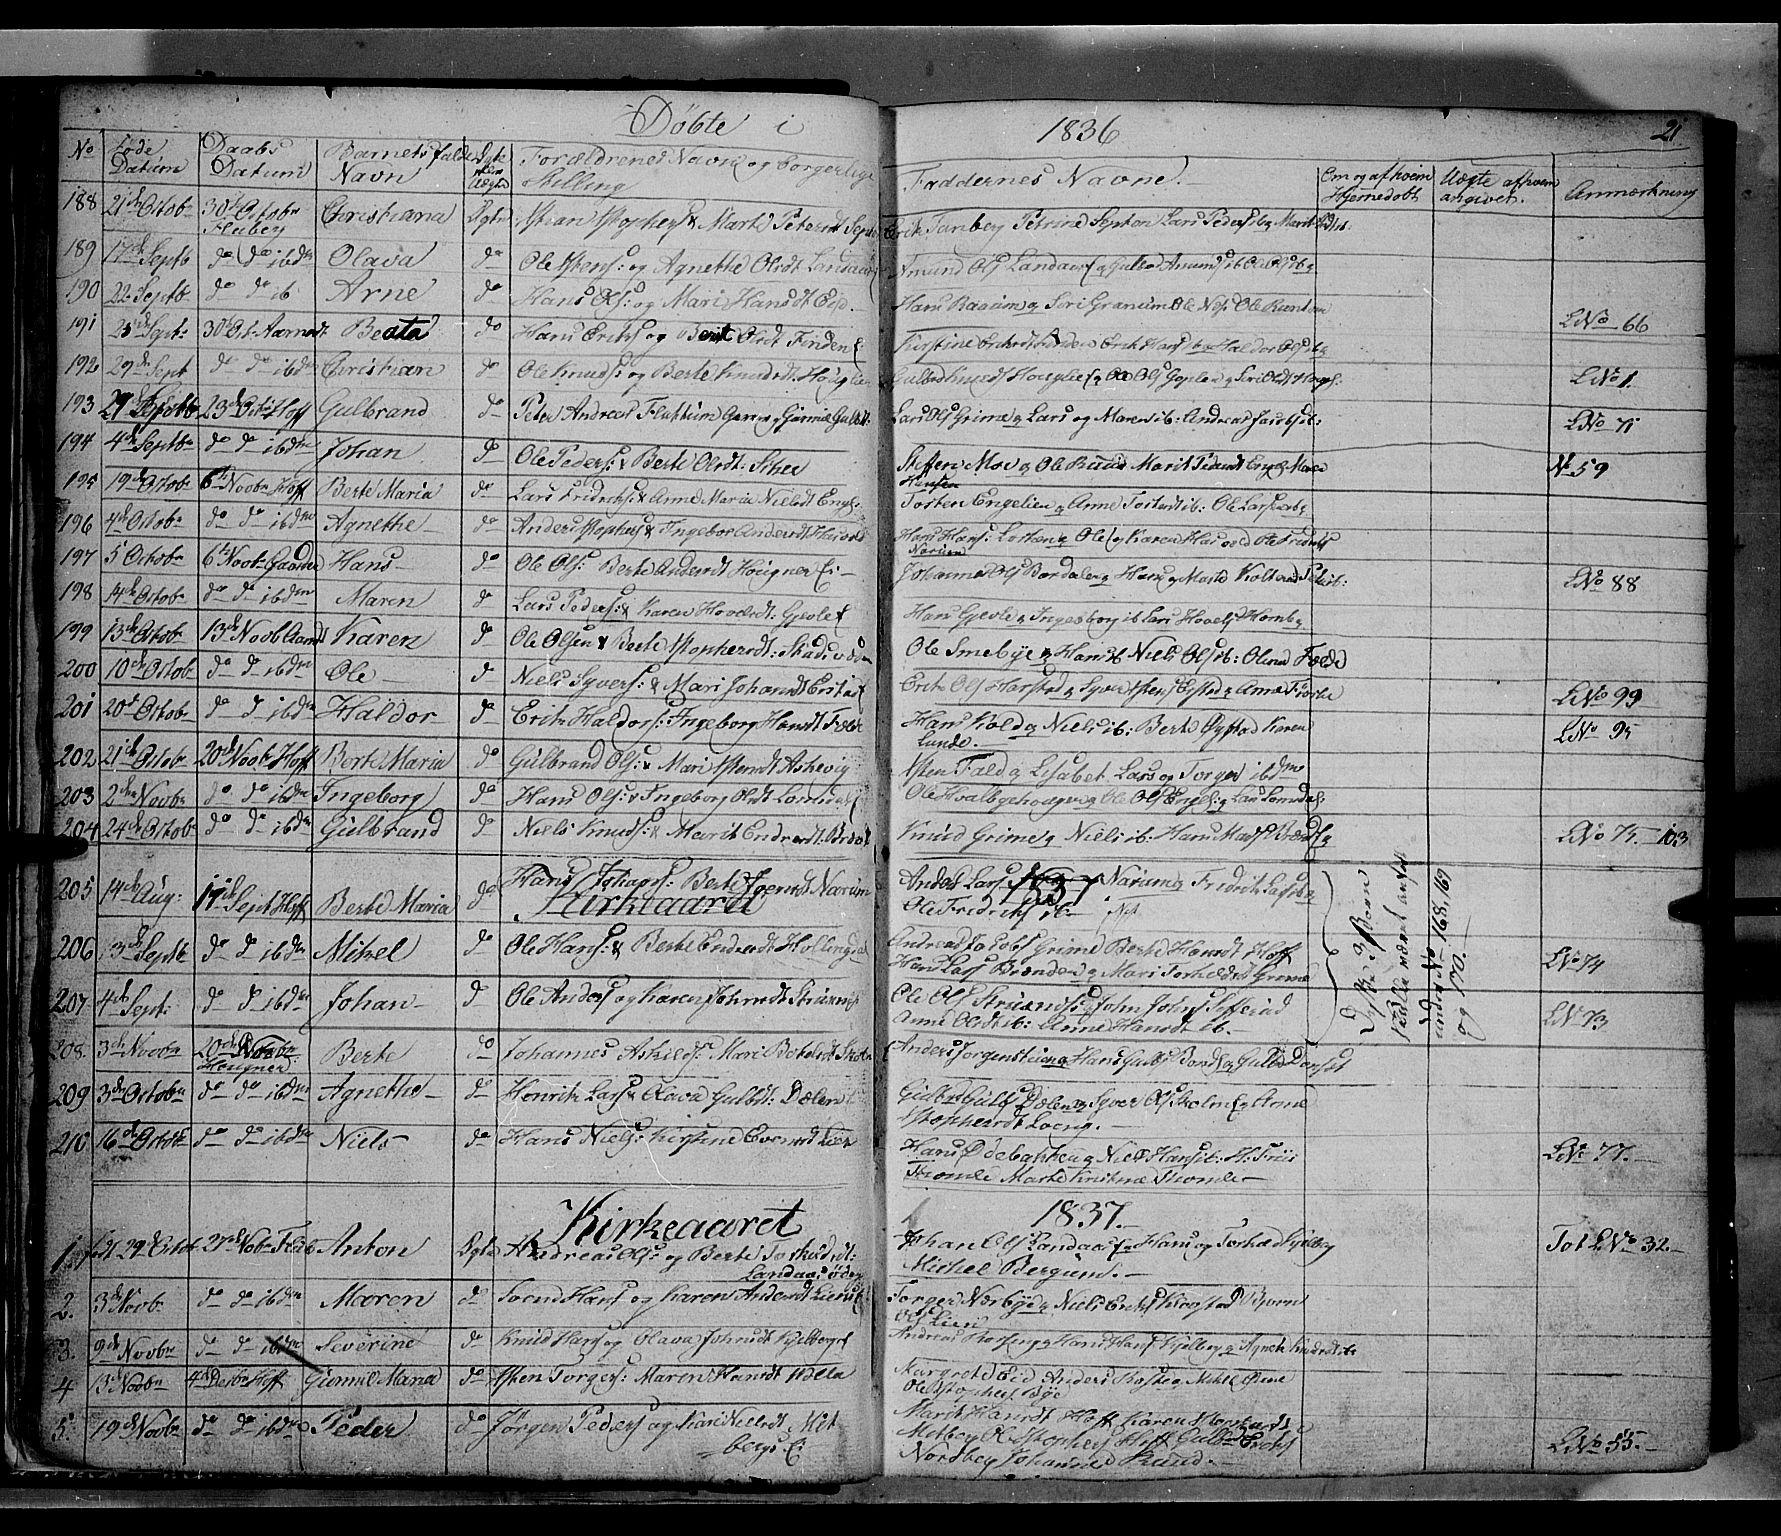 SAH, Land prestekontor, Klokkerbok nr. 2, 1833-1849, s. 21